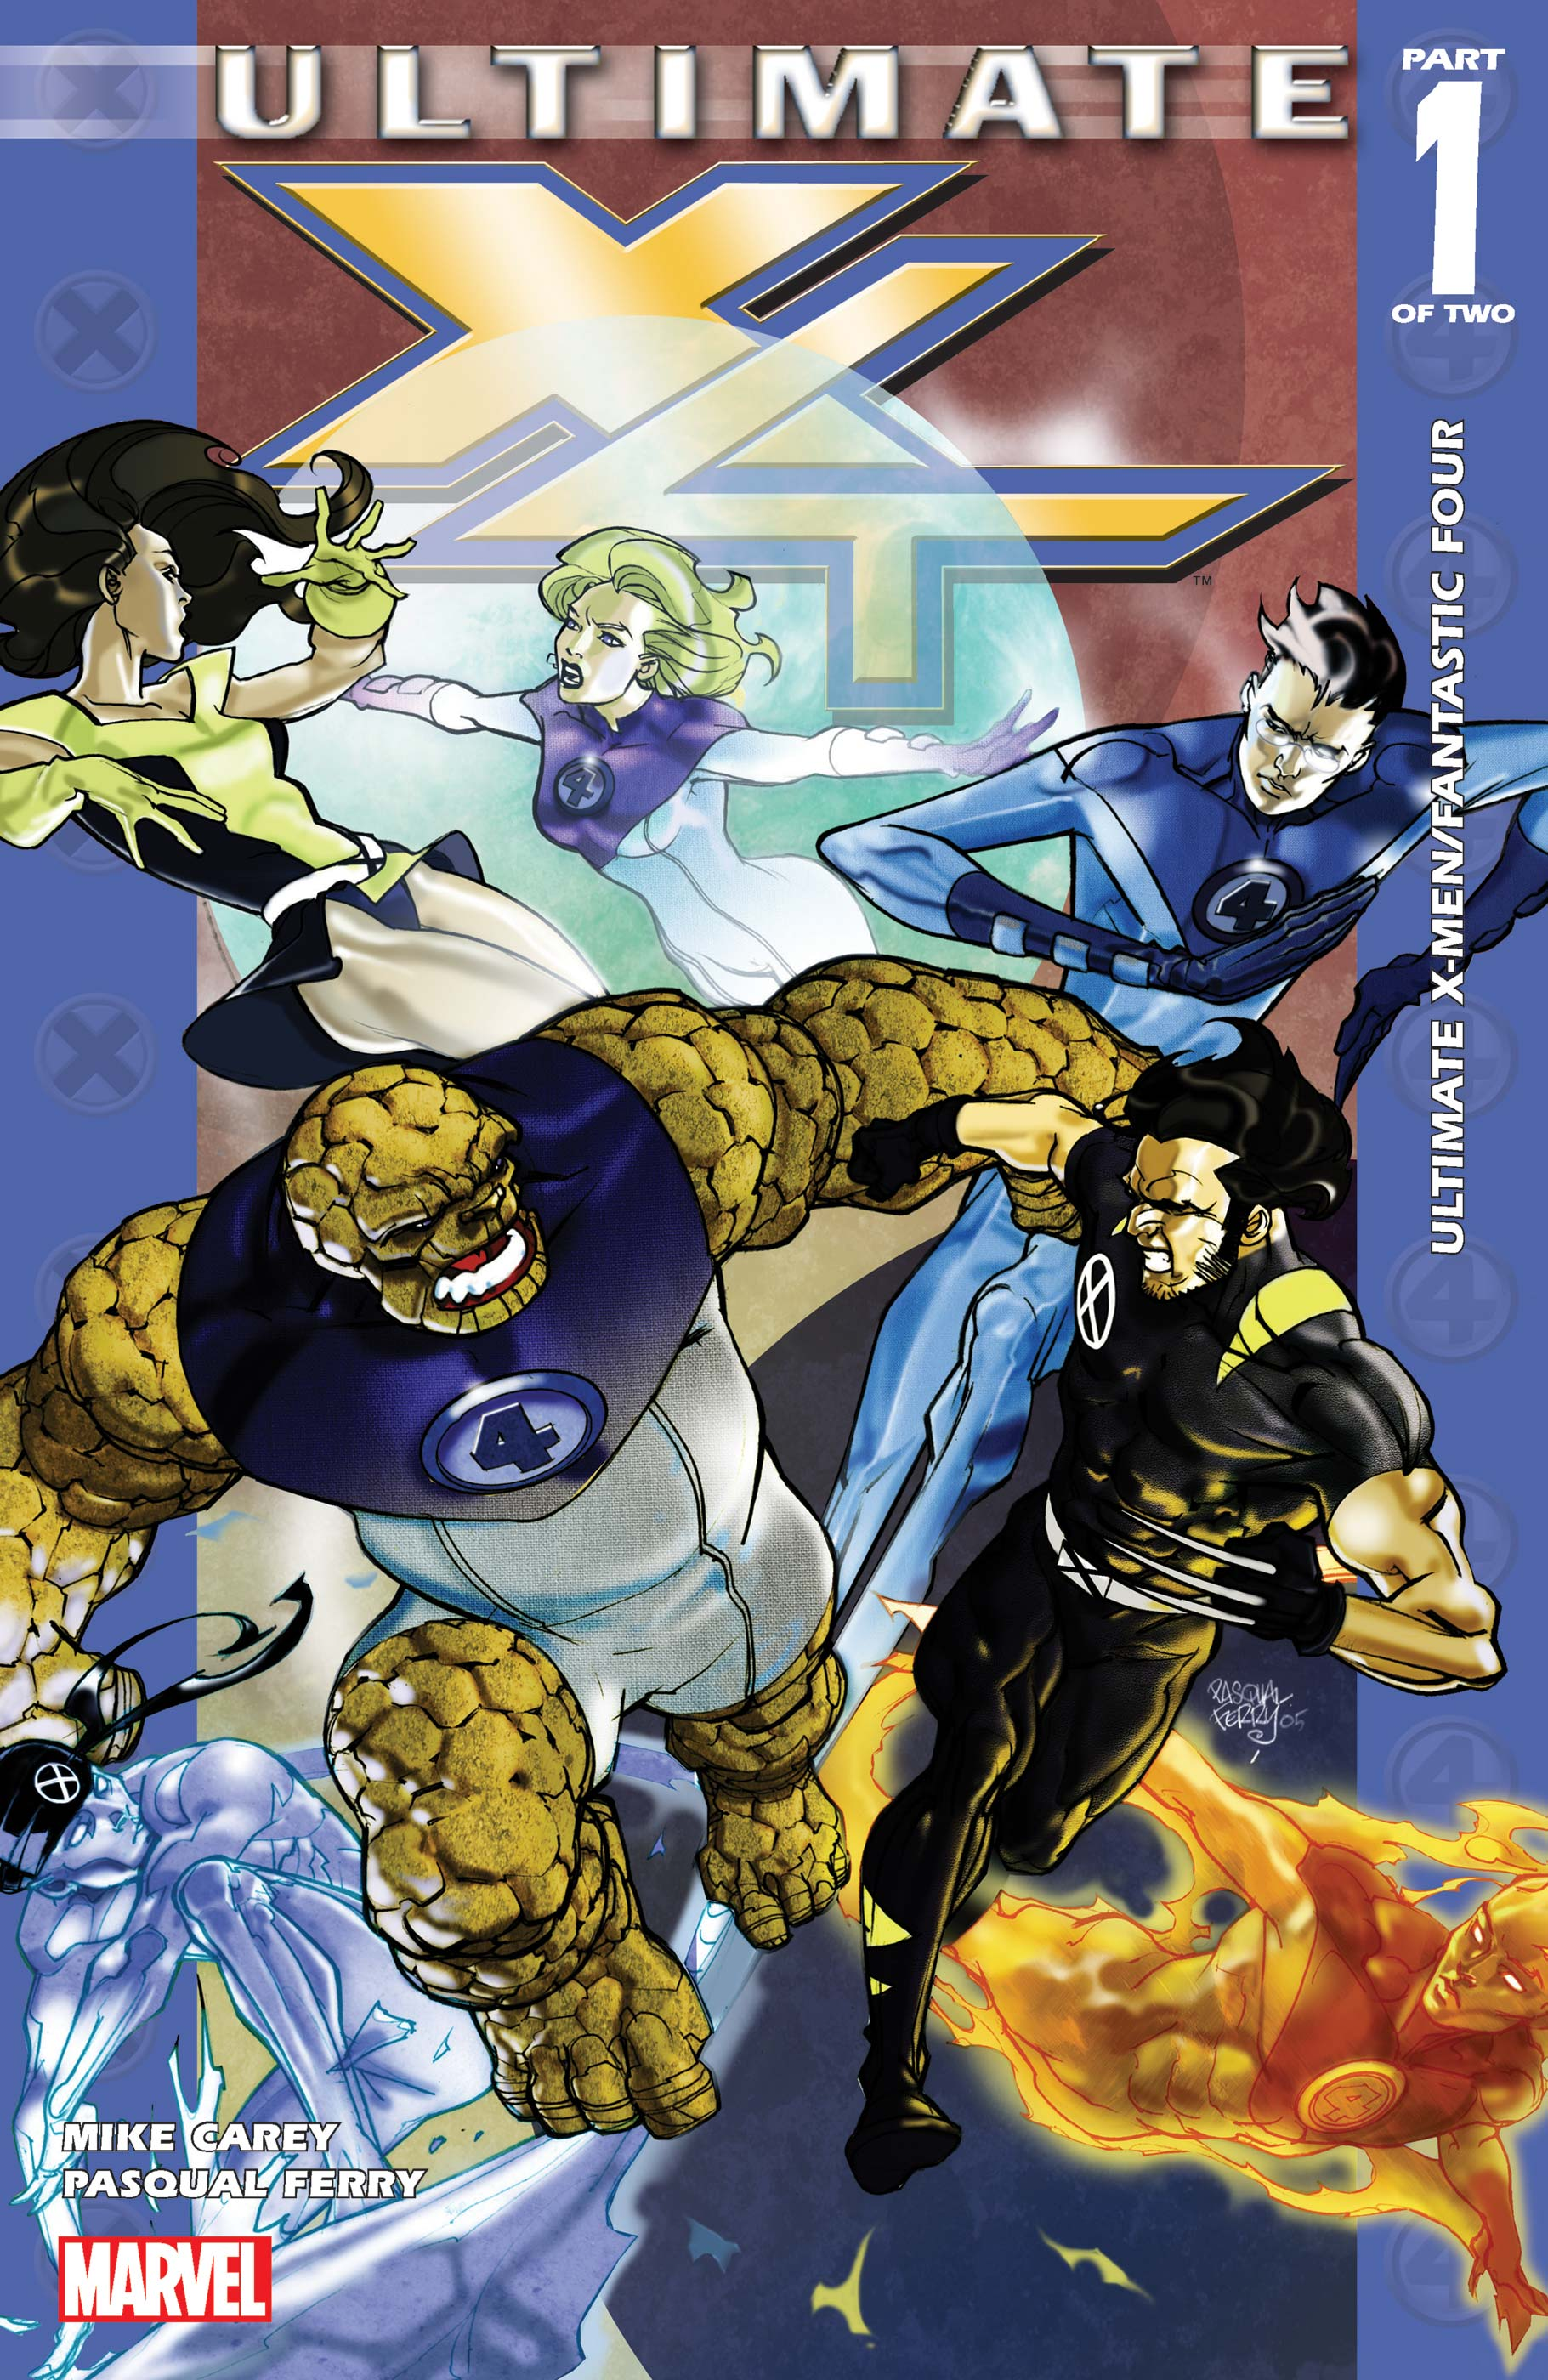 Ultimate X-Men Fantastic Four (2005) Complete Bundle - Used